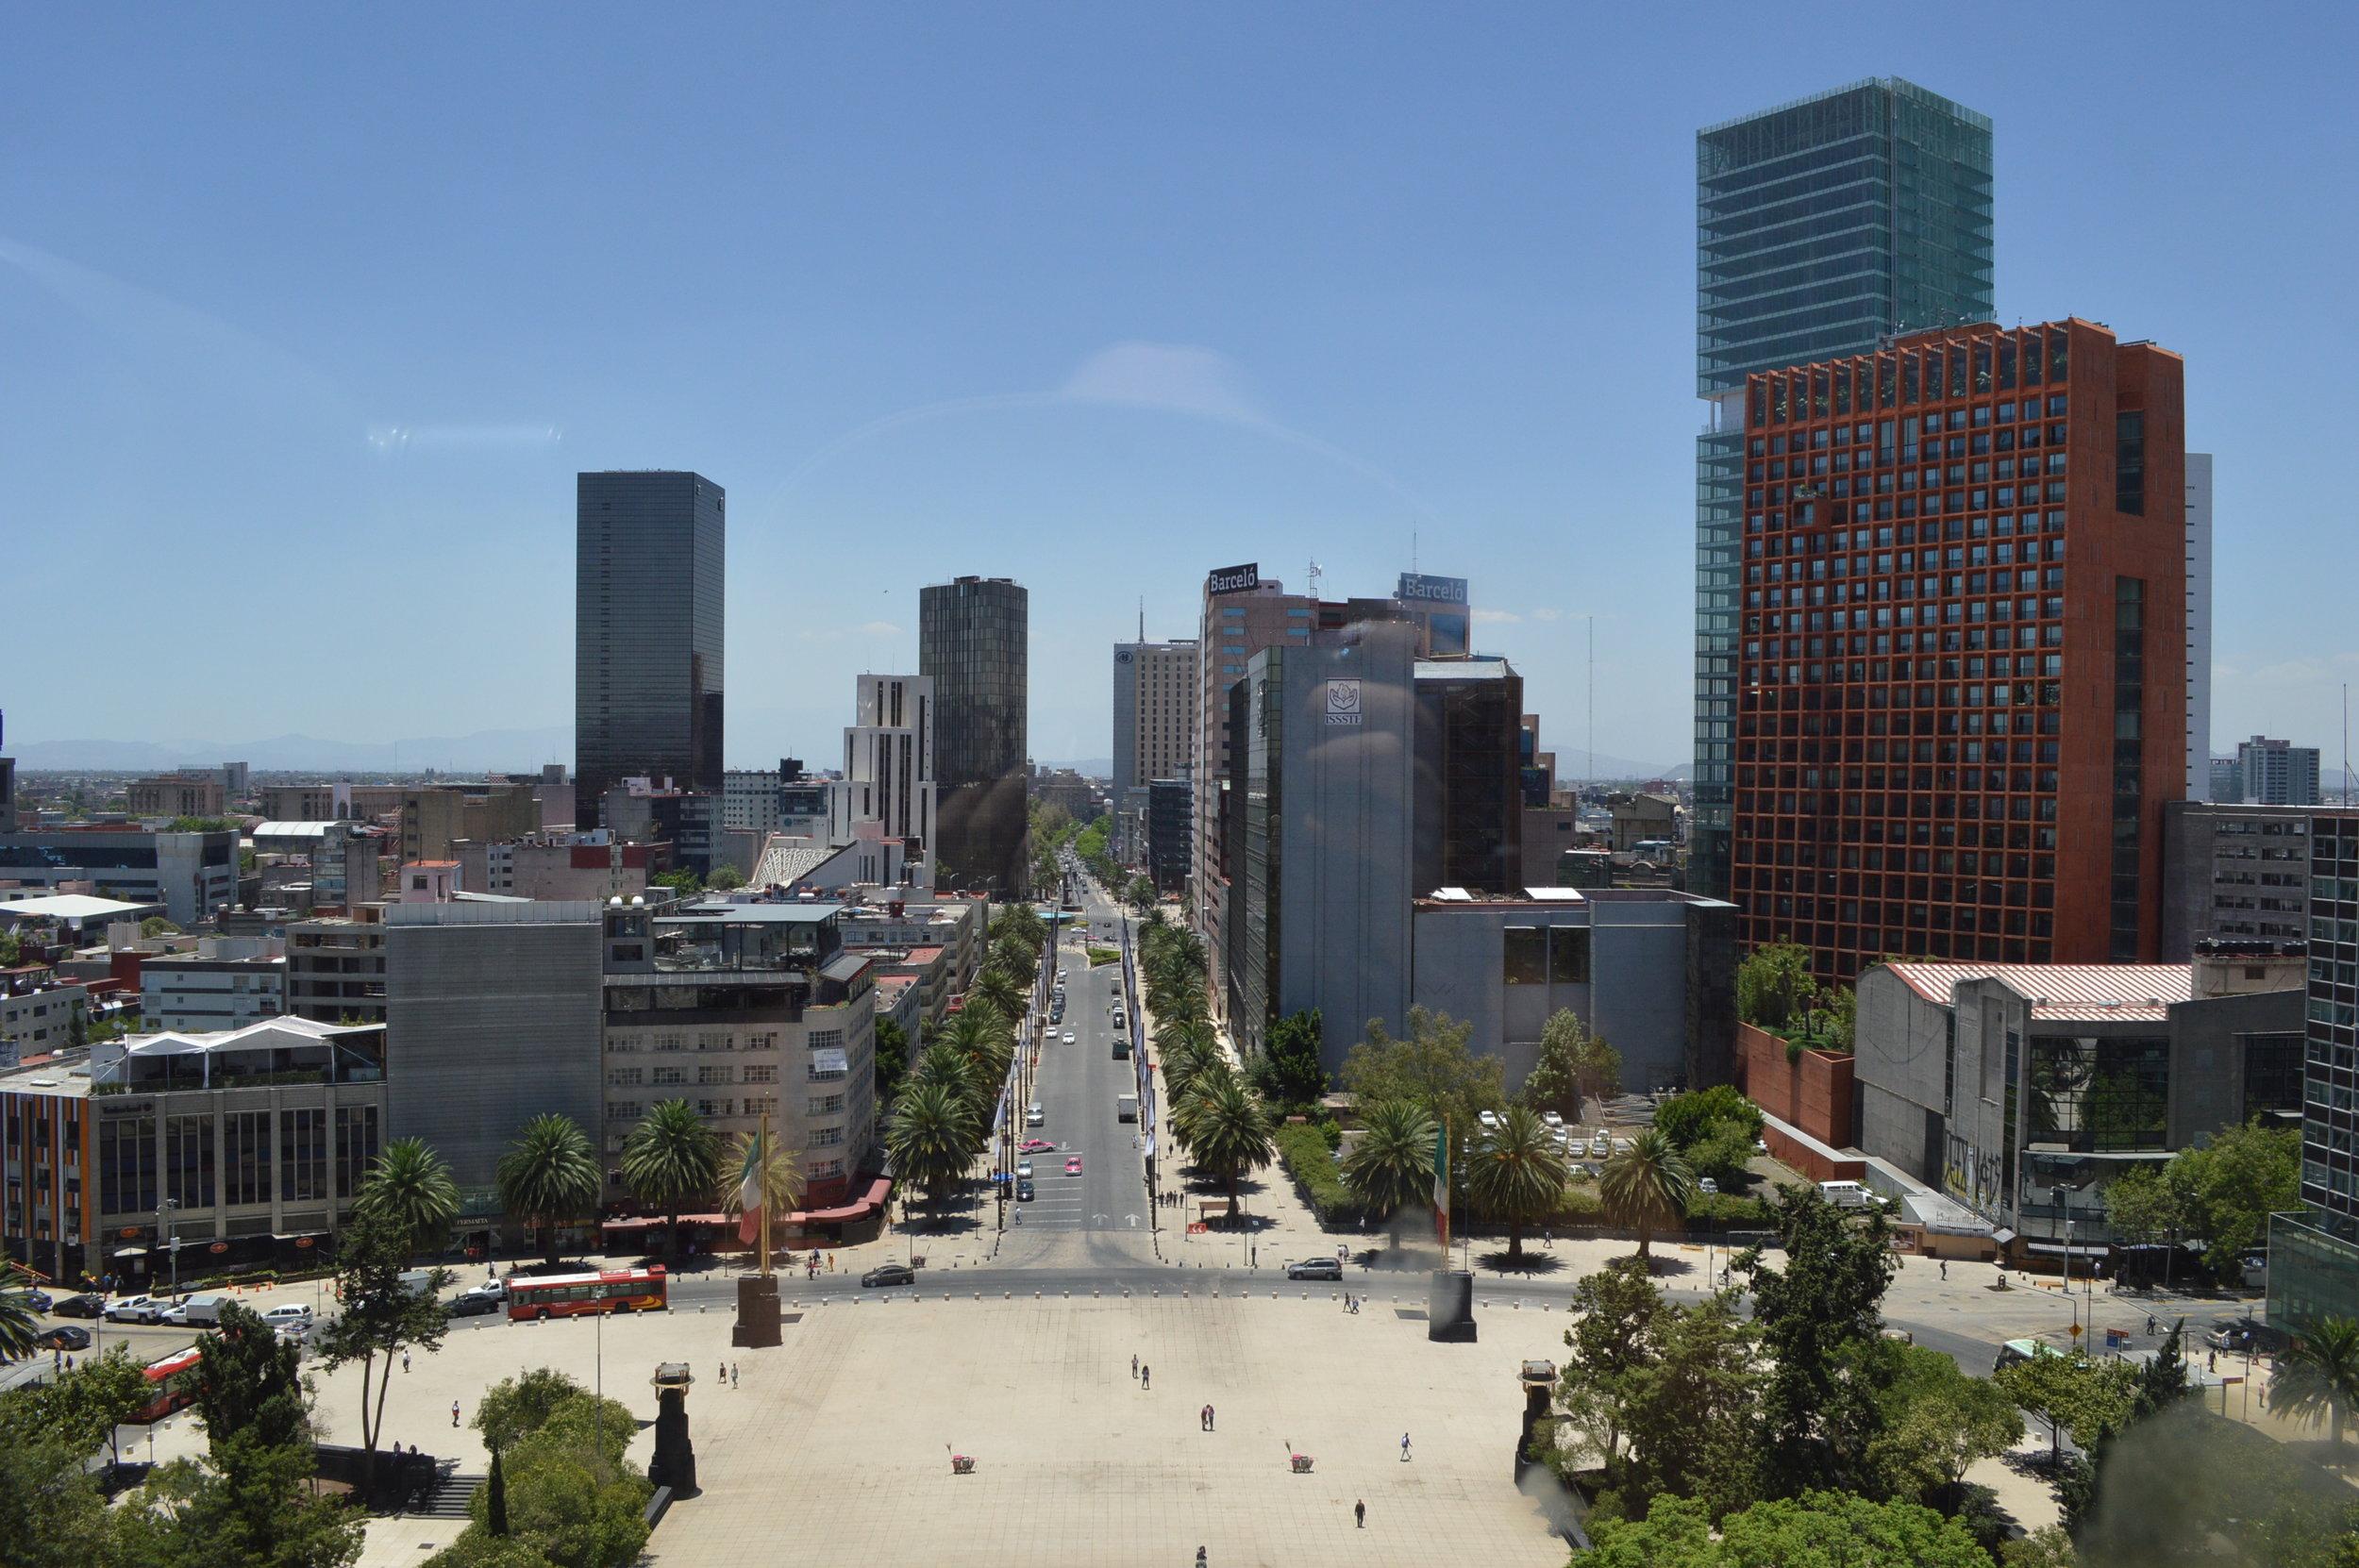 Is Mexico City safe for travelers? / View of Mexico City / goseekexplore.com